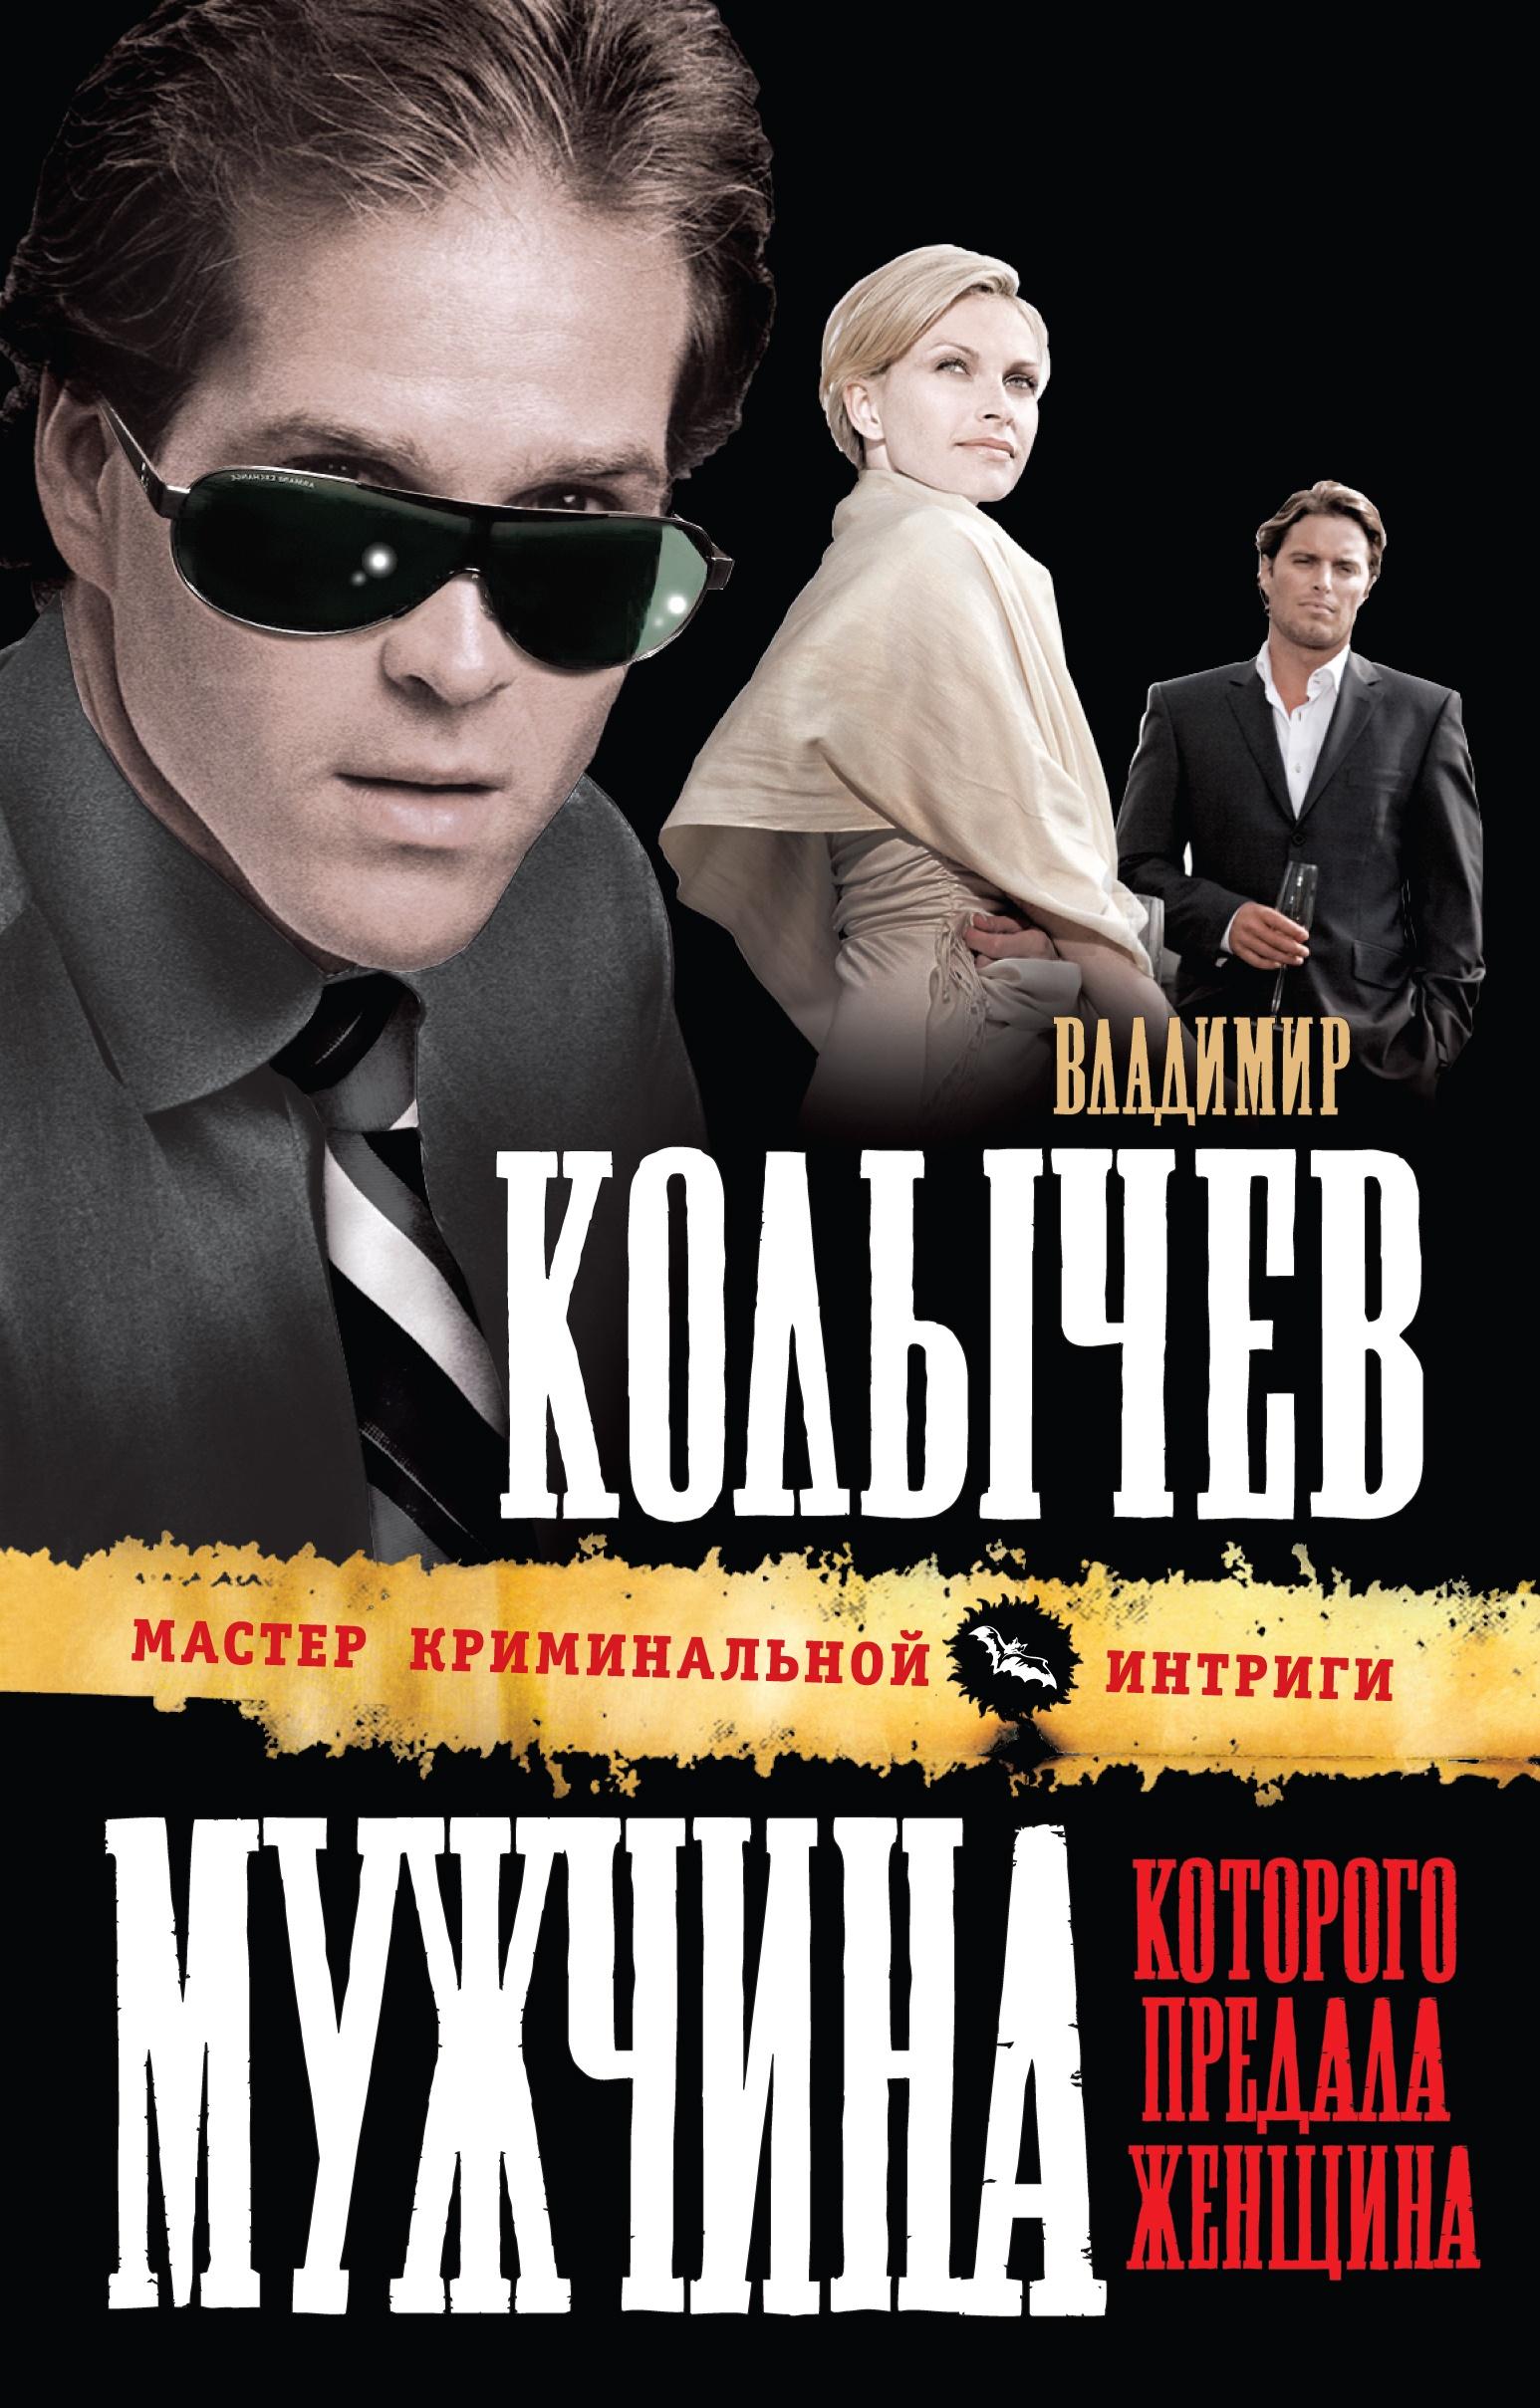 Владимир Колычев Мужчина, которого предала женщина владимир колычев мужчина которого предала женщина